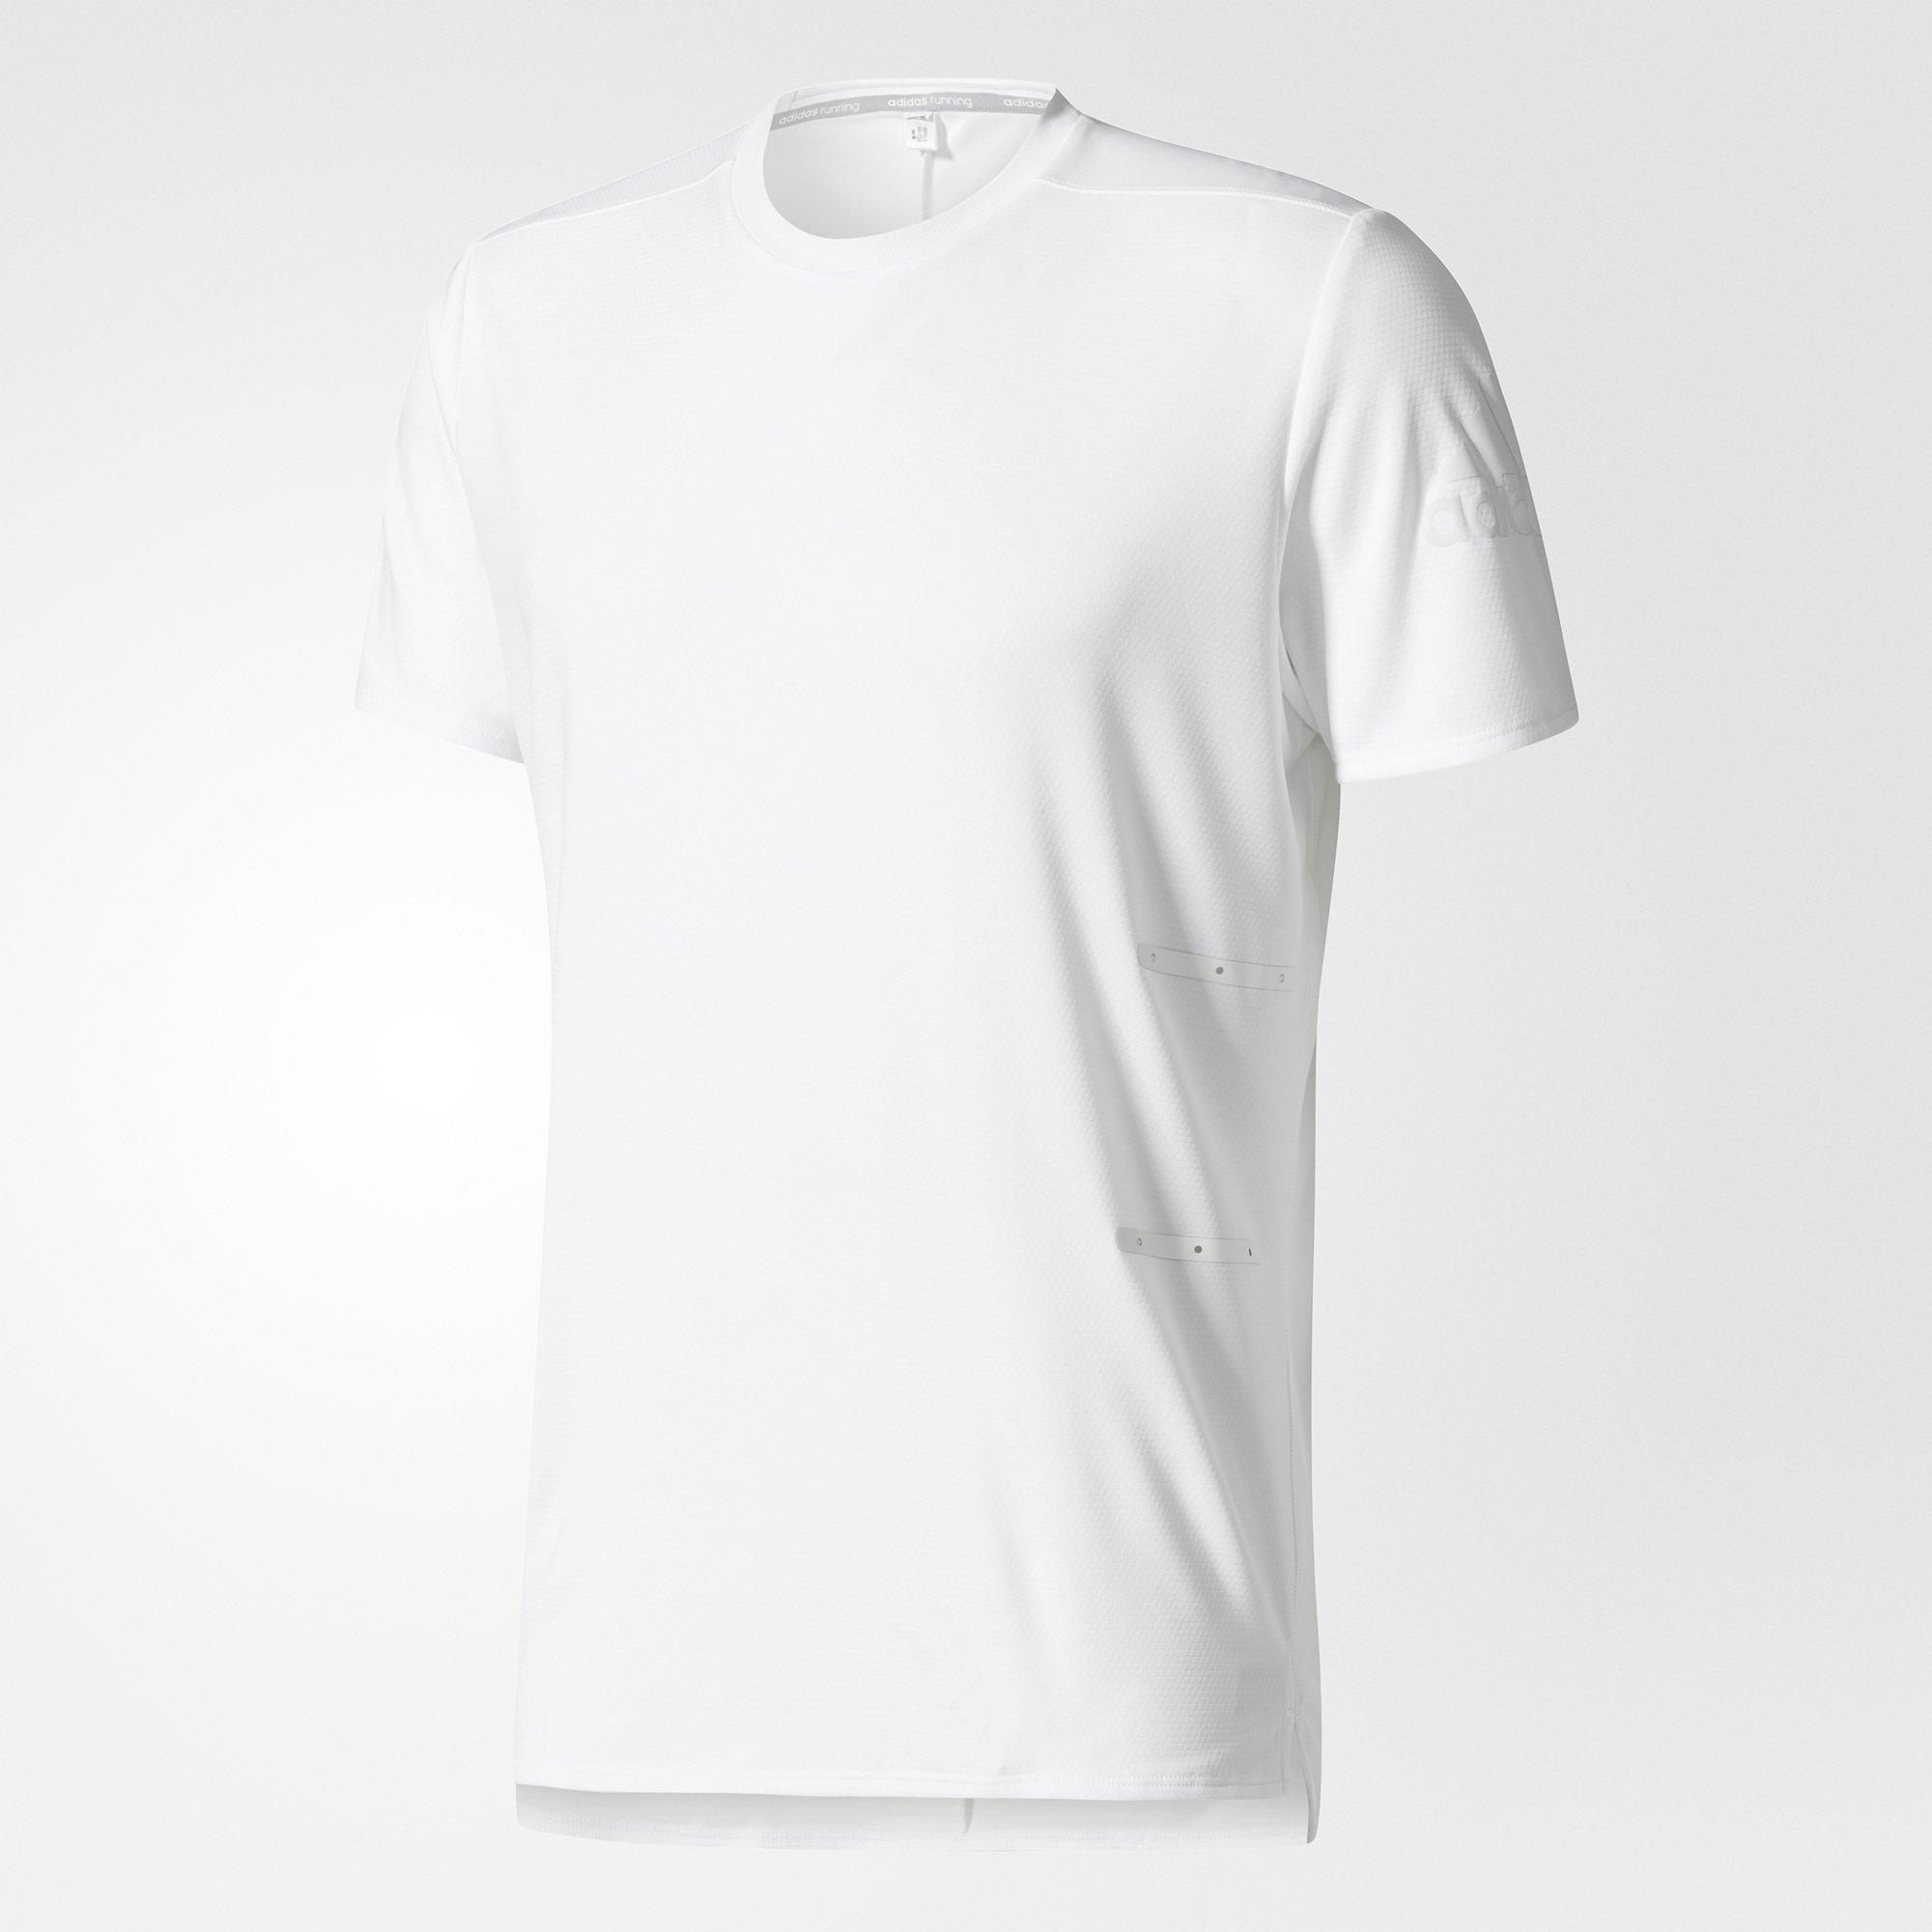 Мужская футболка Adidas Supernova 37C SS BQ2199 52-54 RU